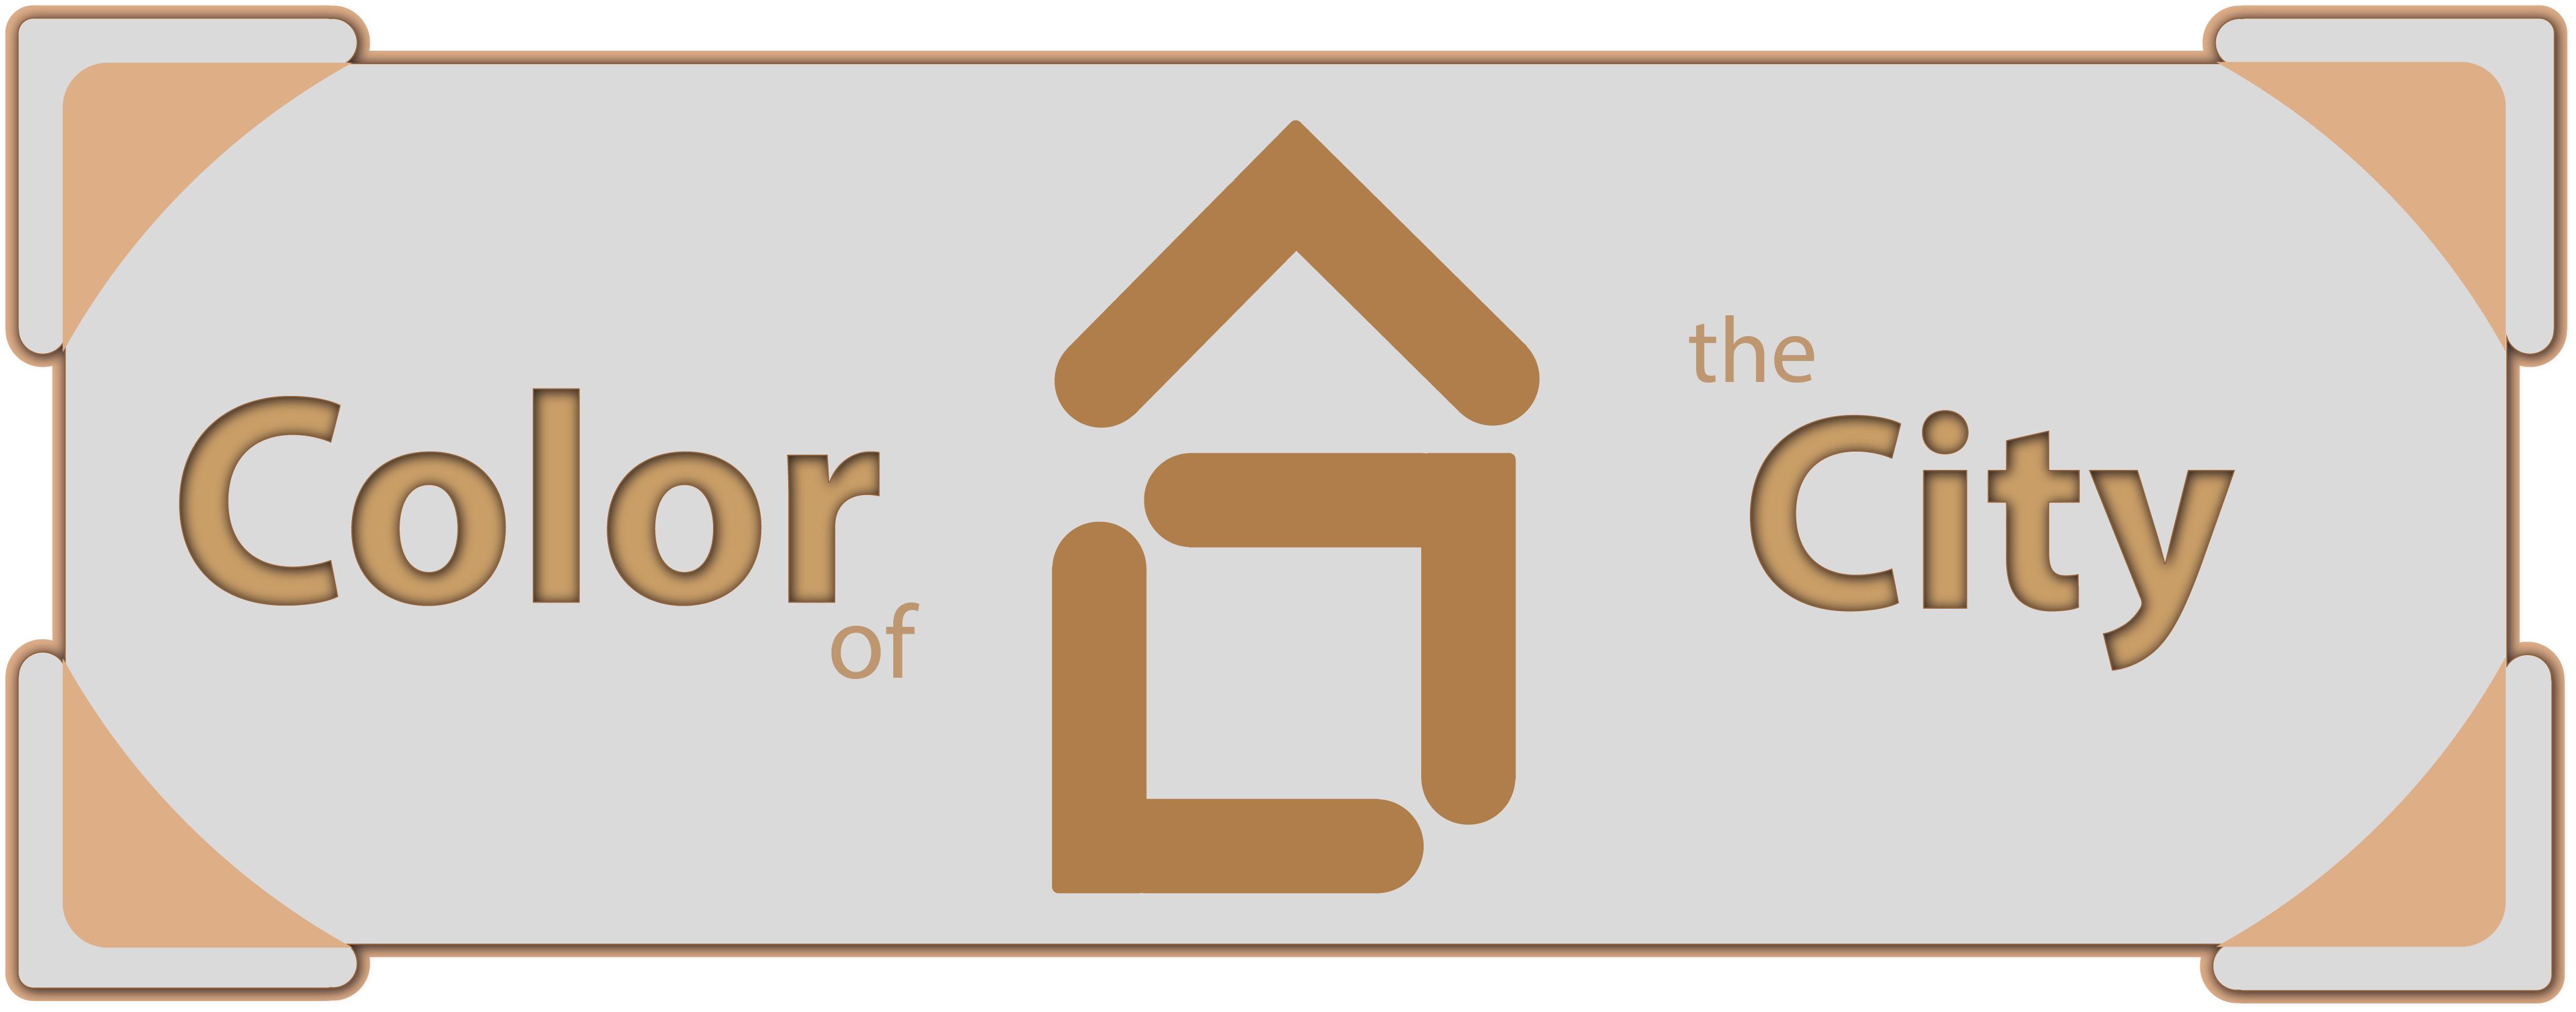 Необходим логотип для сети хостелов фото f_54551a76276007d3.png